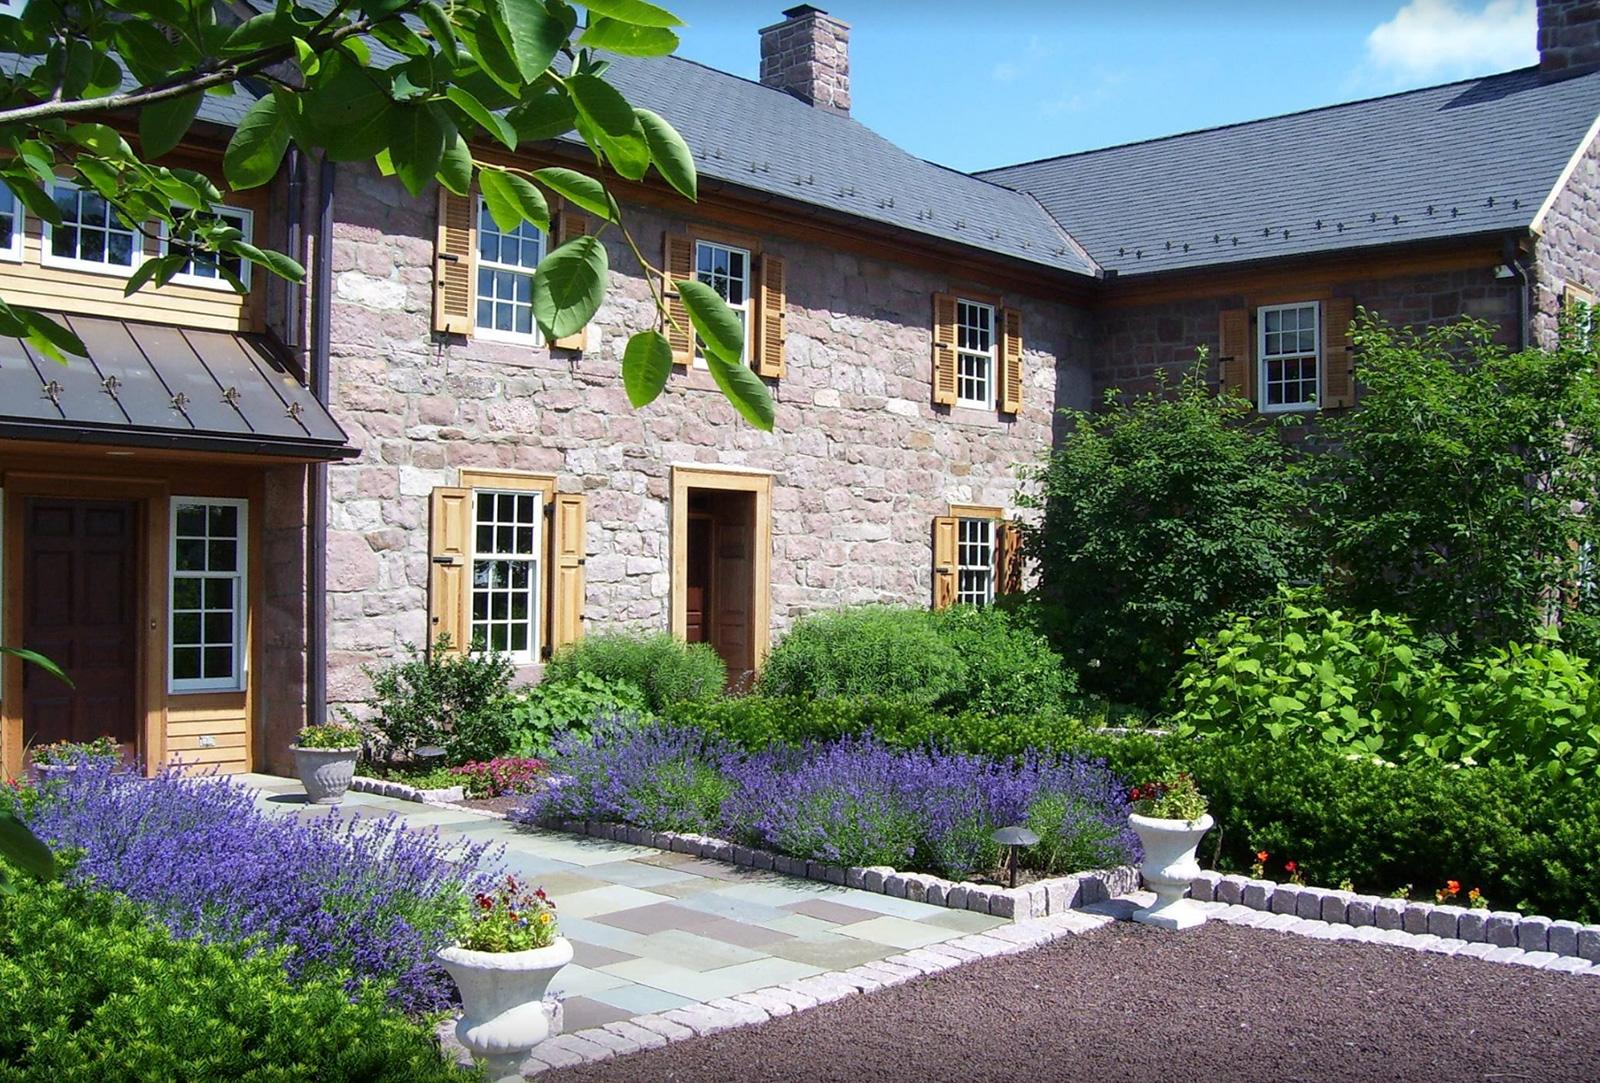 Louver shutters on a farmhouse